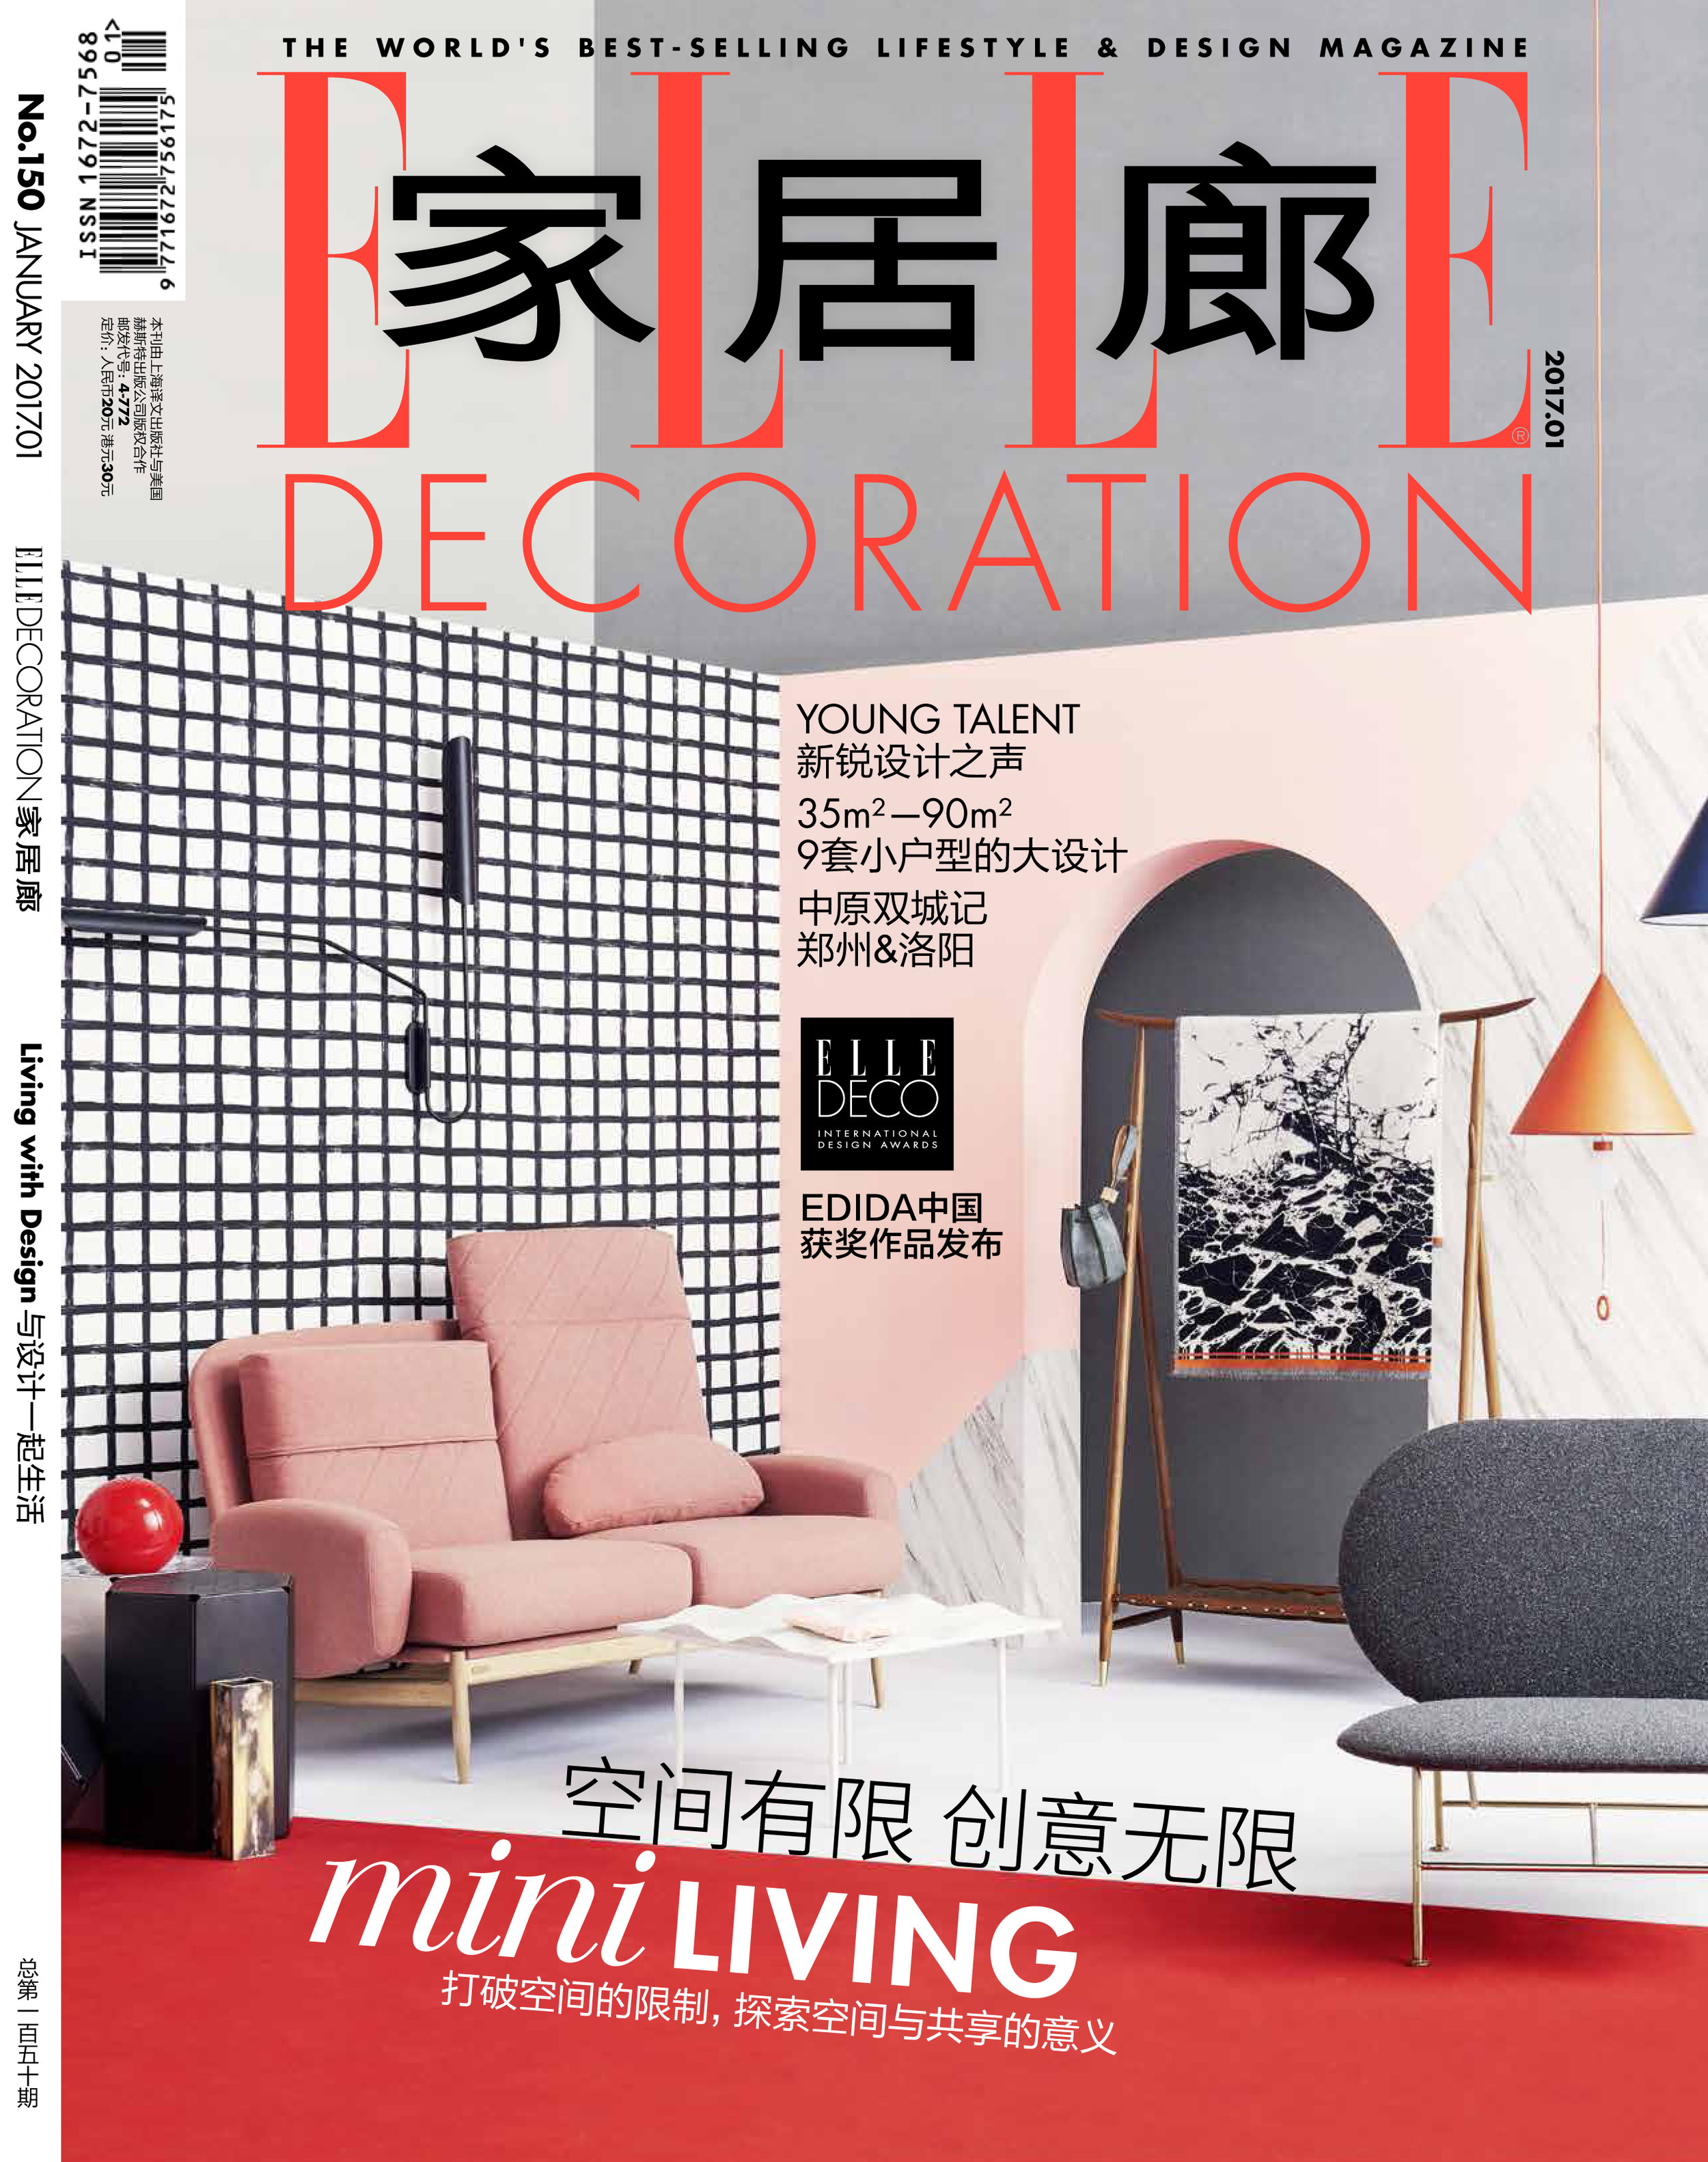 Elle Decor China - Fabulous Small Spaces